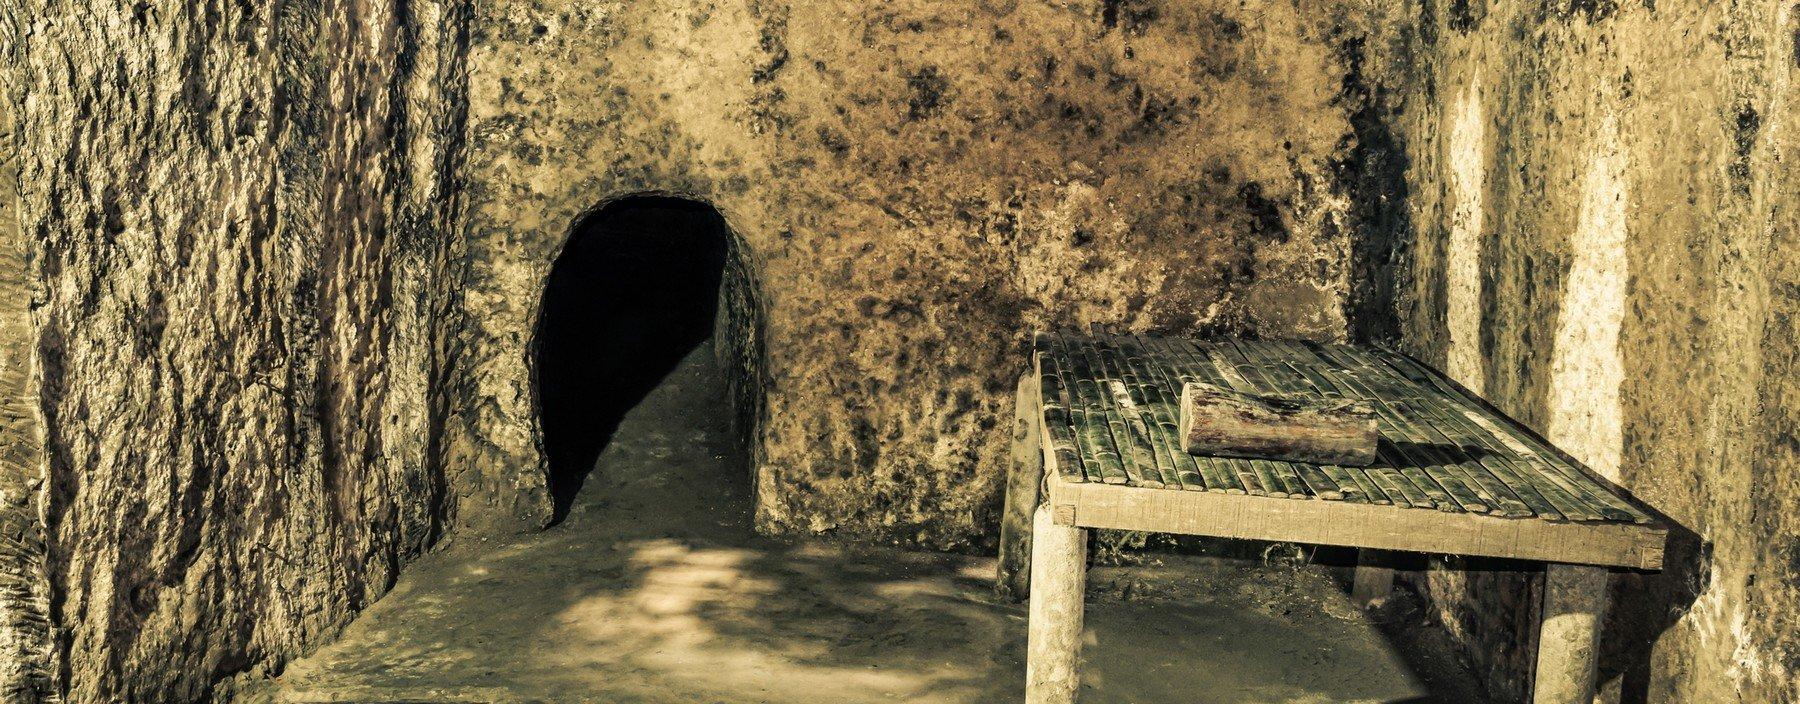 vn, ho chi minh city, cu chi tunnels (12).jpg